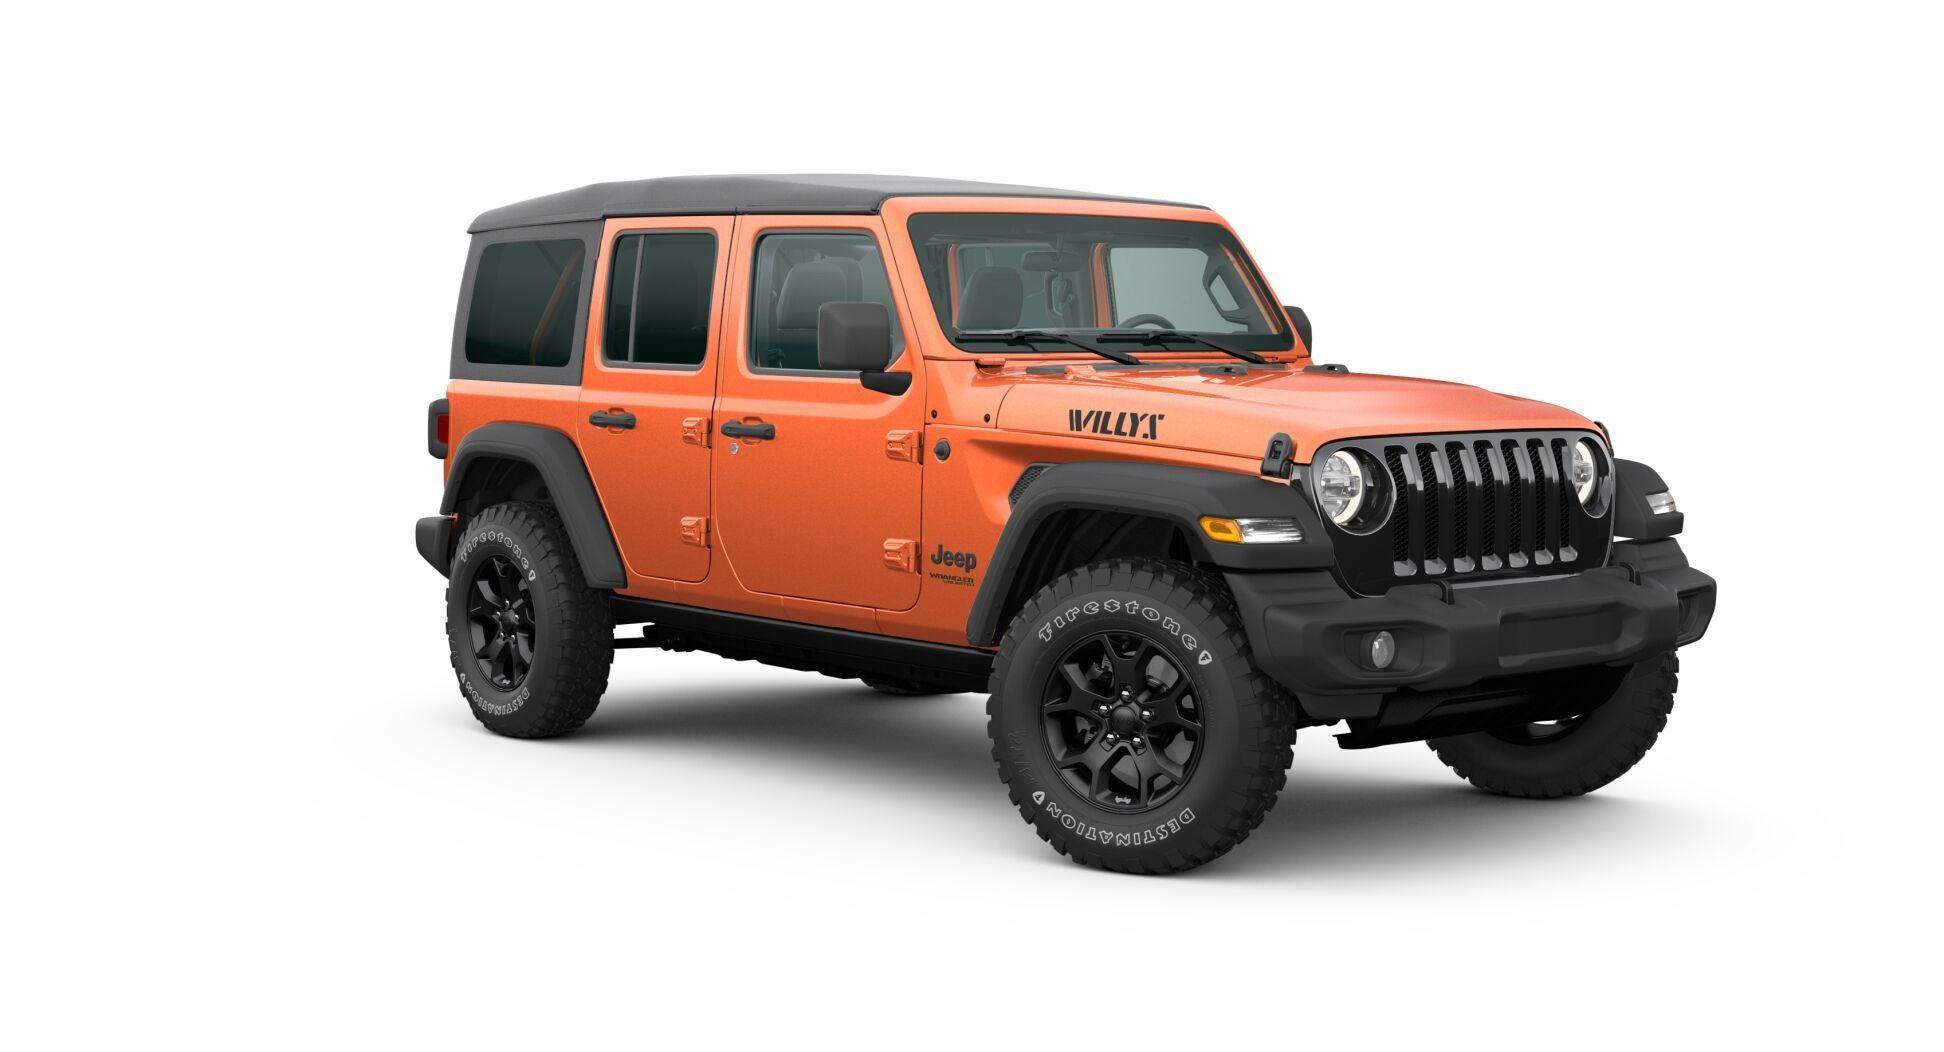 2020 Jeep Wrangler Trim Options Explained Rubicon Unlimited Sahara